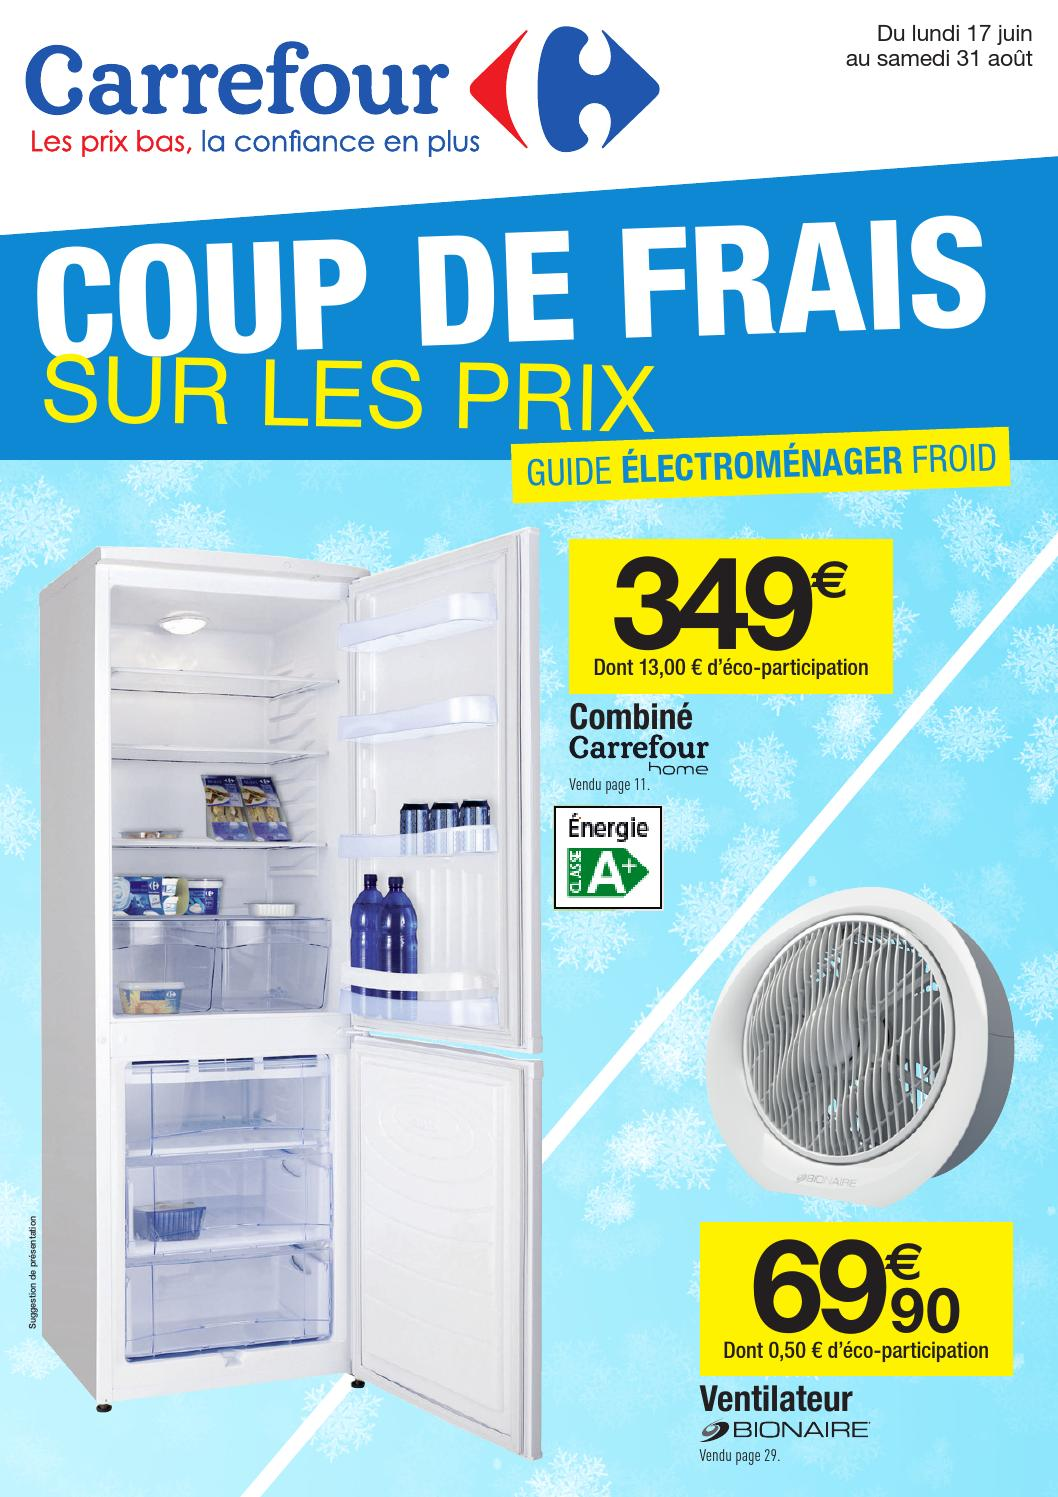 Catalogue carrefour coup de frais by INFOPRO DIGITAL issuu